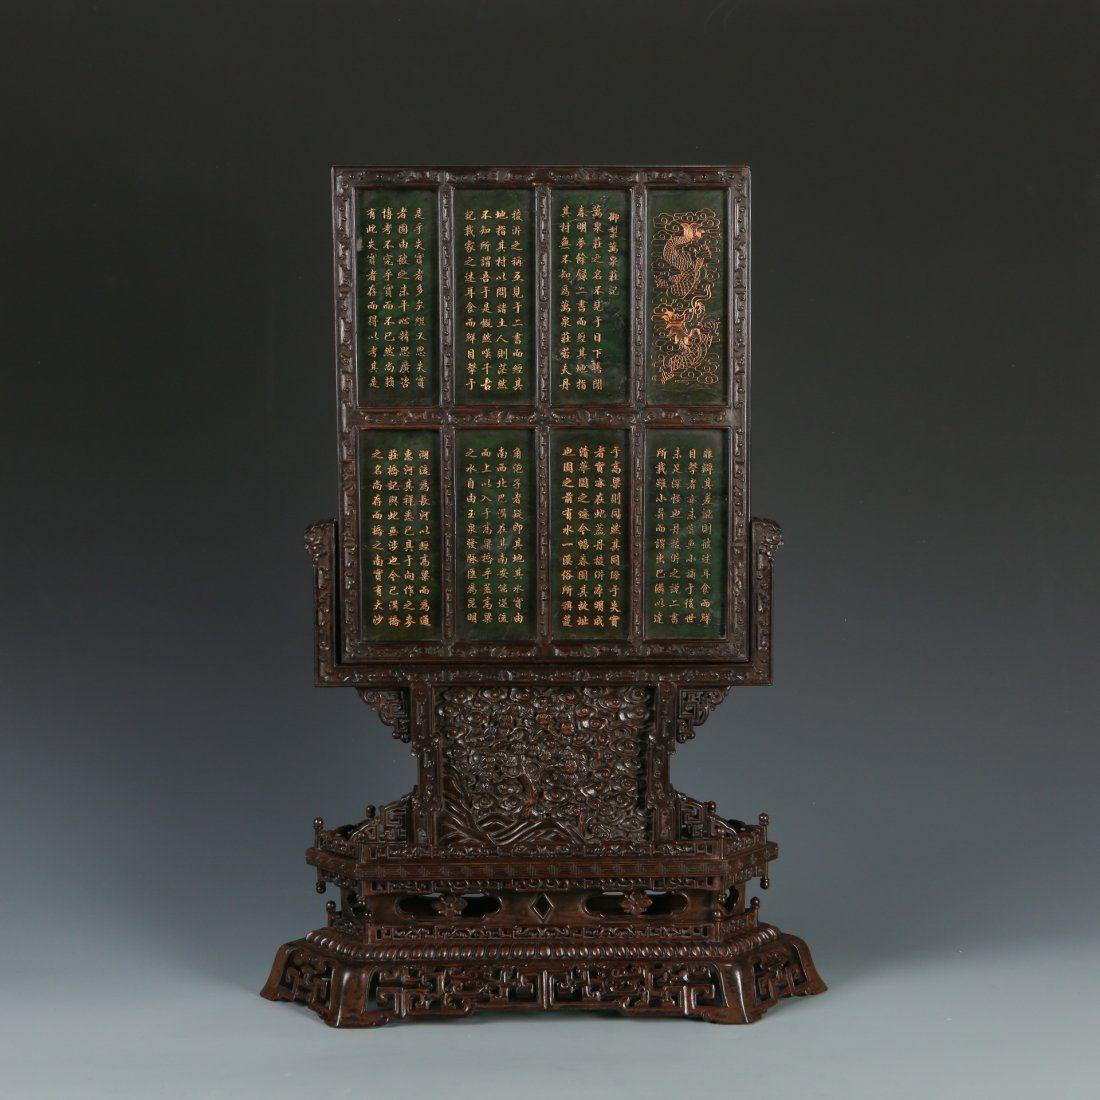 Exquisite Green Jade Table Screen on Zitan Wood Base